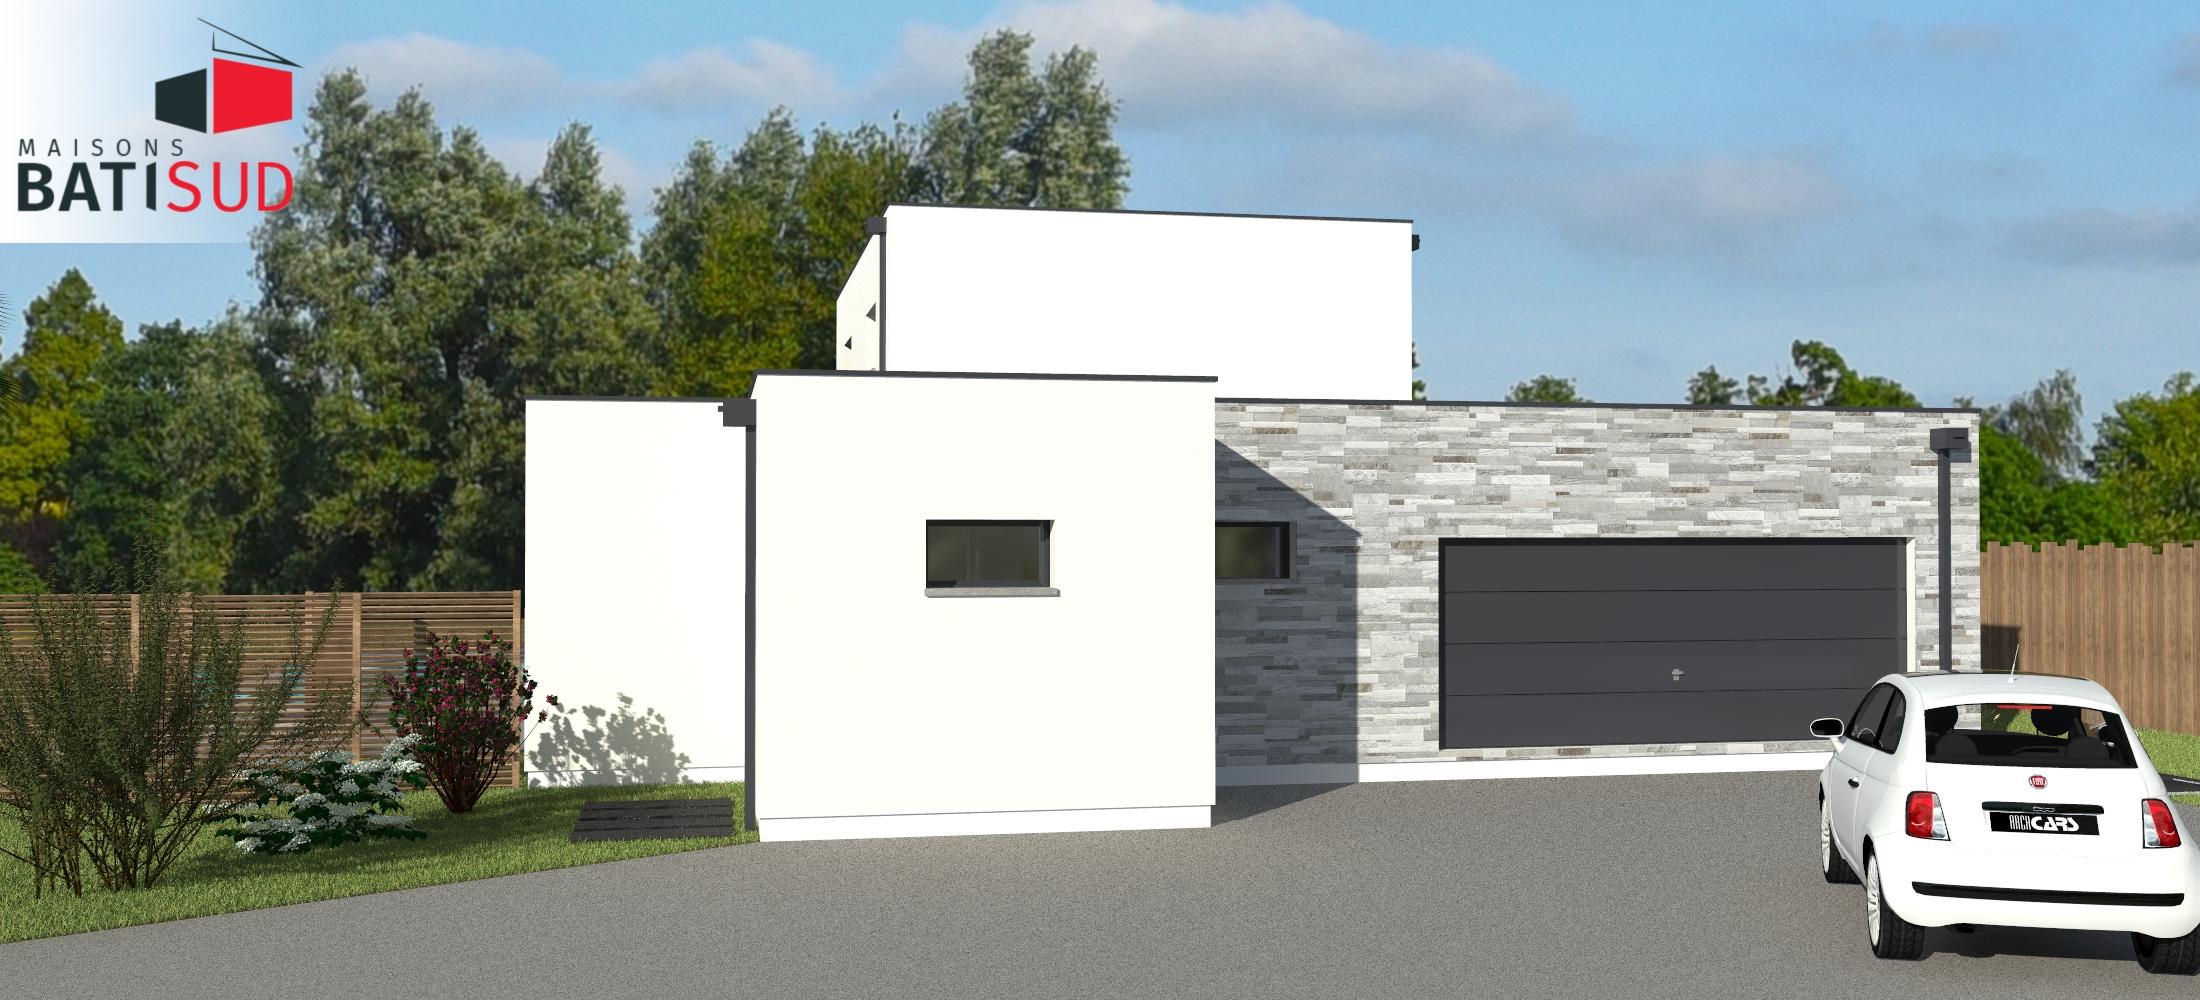 bati sud maison sur mesure pessac maisons bati sud. Black Bedroom Furniture Sets. Home Design Ideas